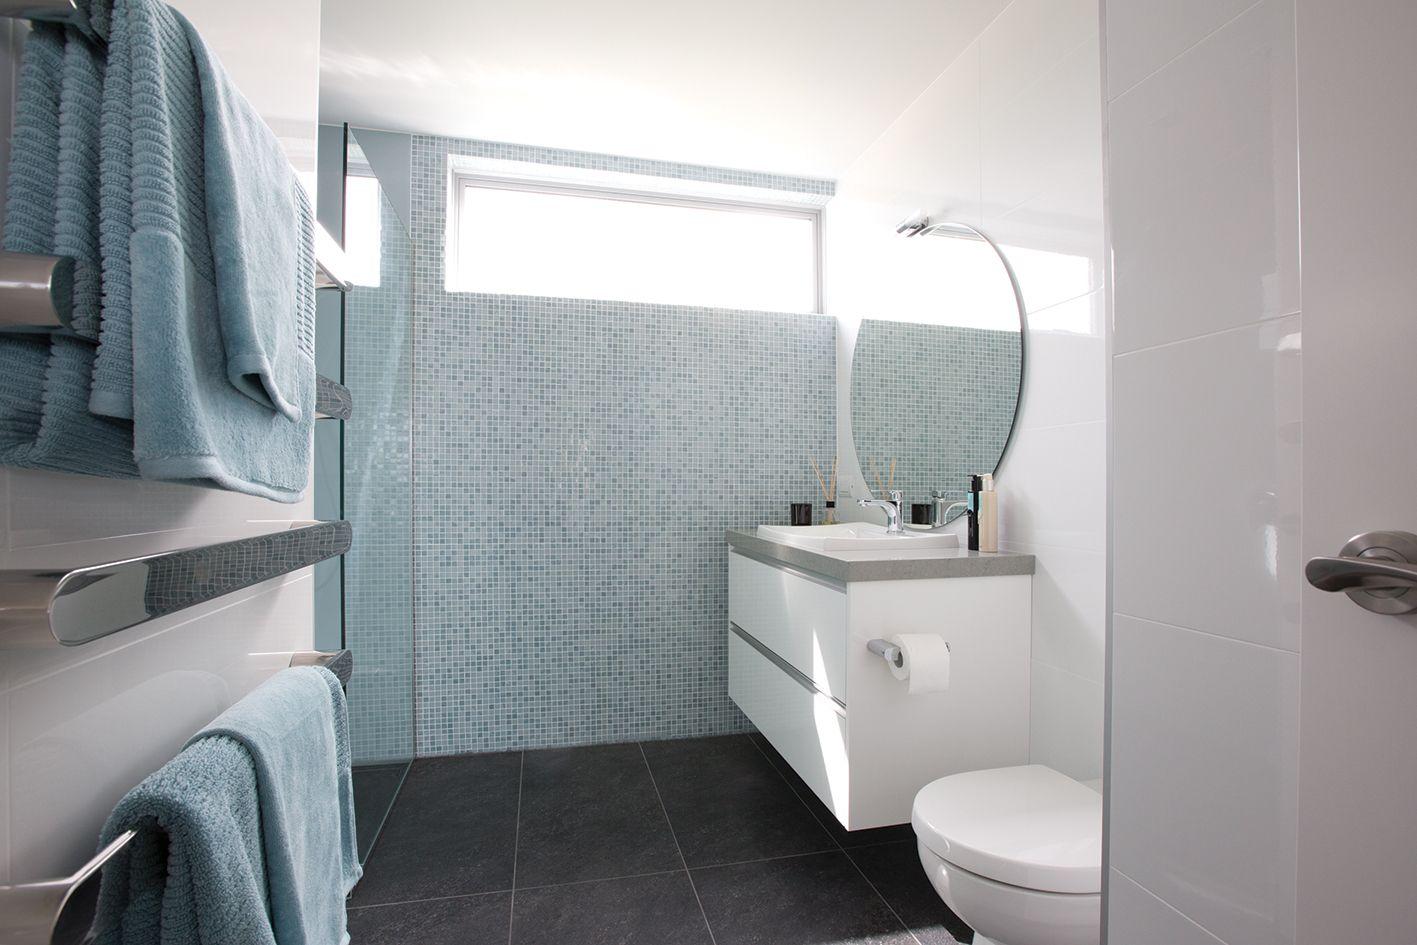 Bisazza luisa bathroom feature wall bathroom design for Bisazza bathroom ideas